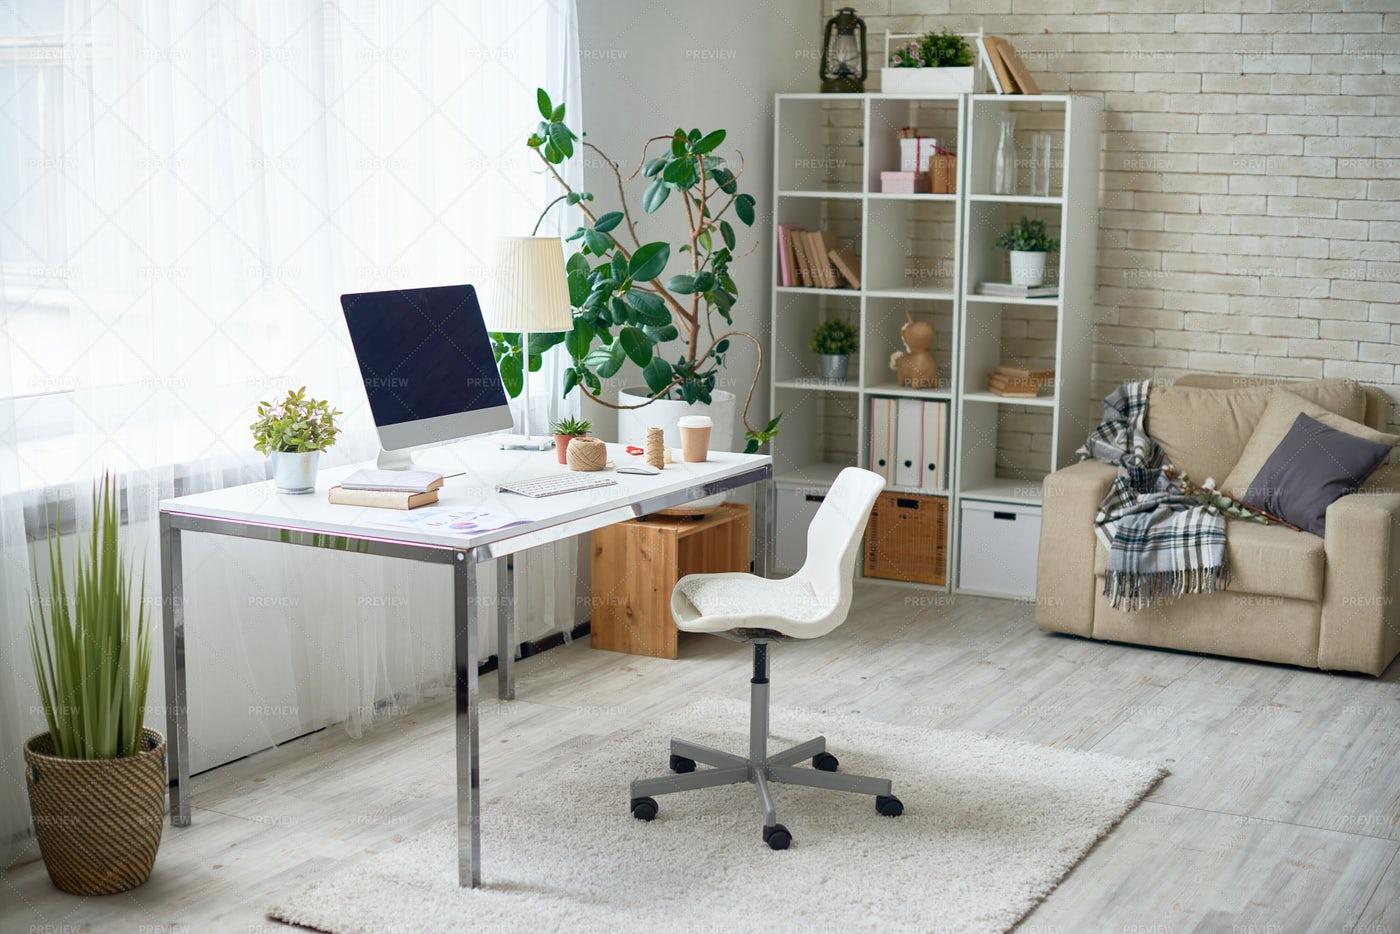 Modern Home Office: Stock Photos